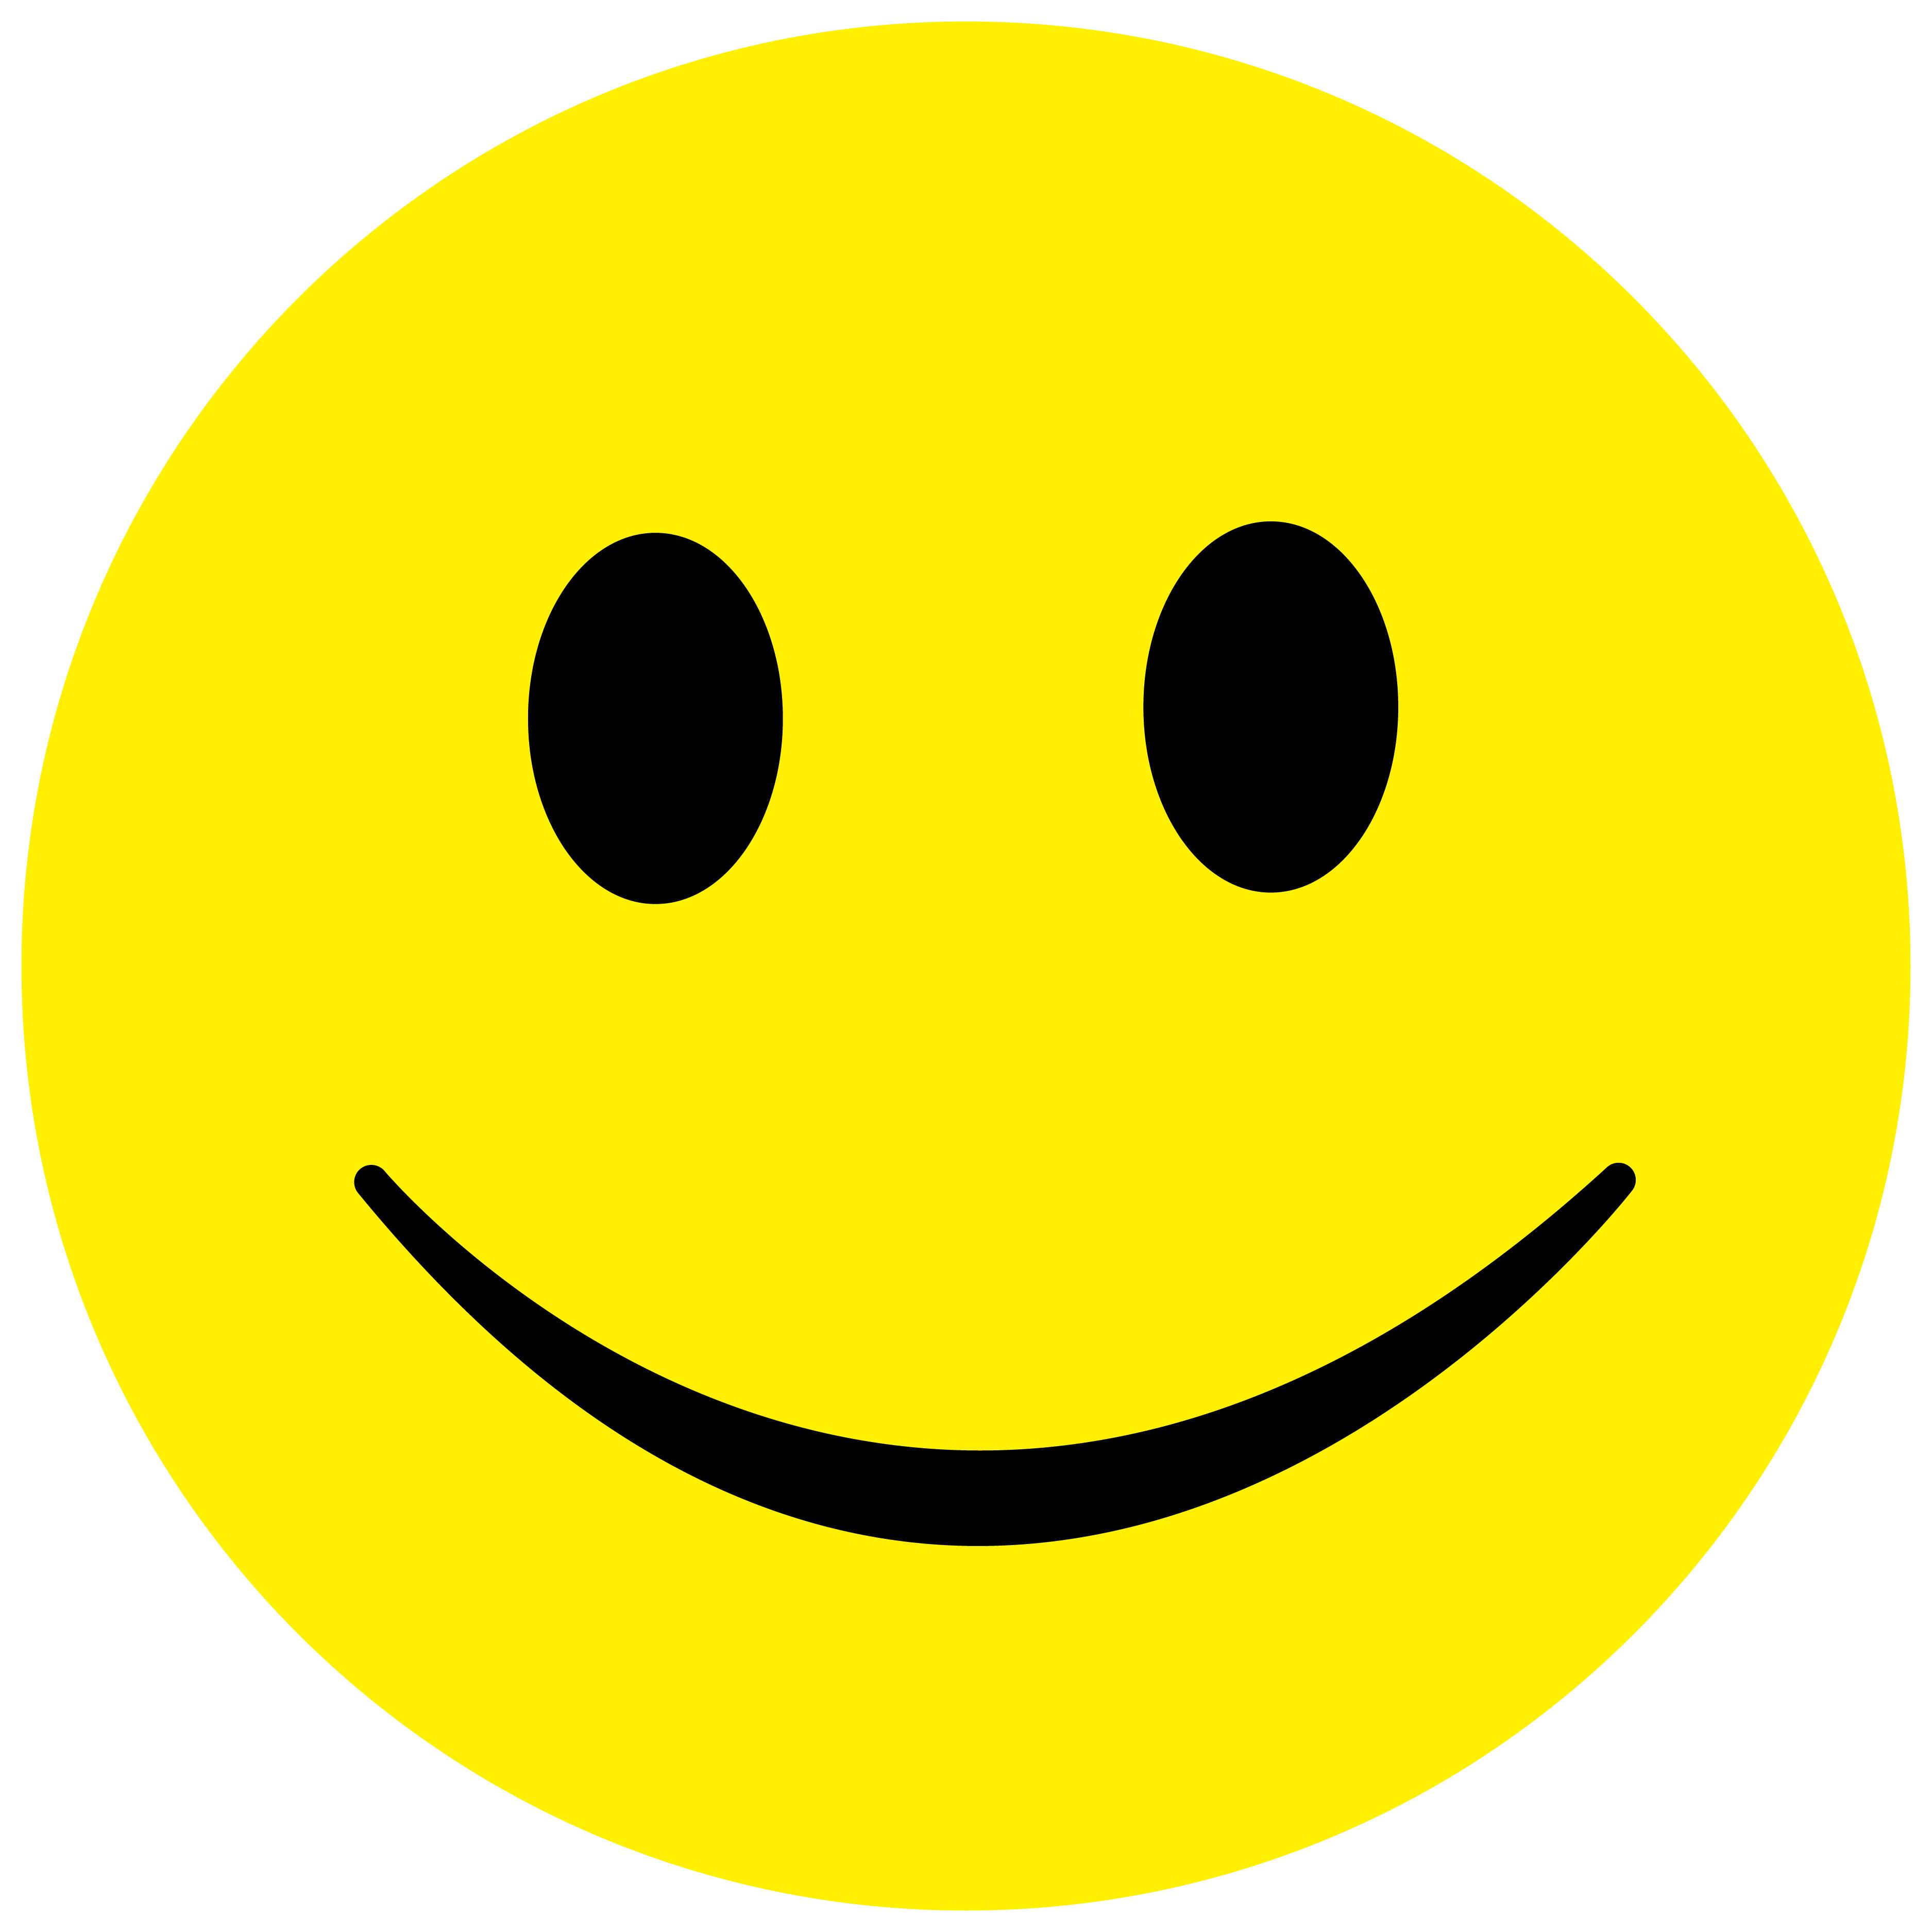 100 Stück Smiley Sticker ø 5cm, Aufkleber Fröhlich Smilies,  ES-SMI-0090-5-100